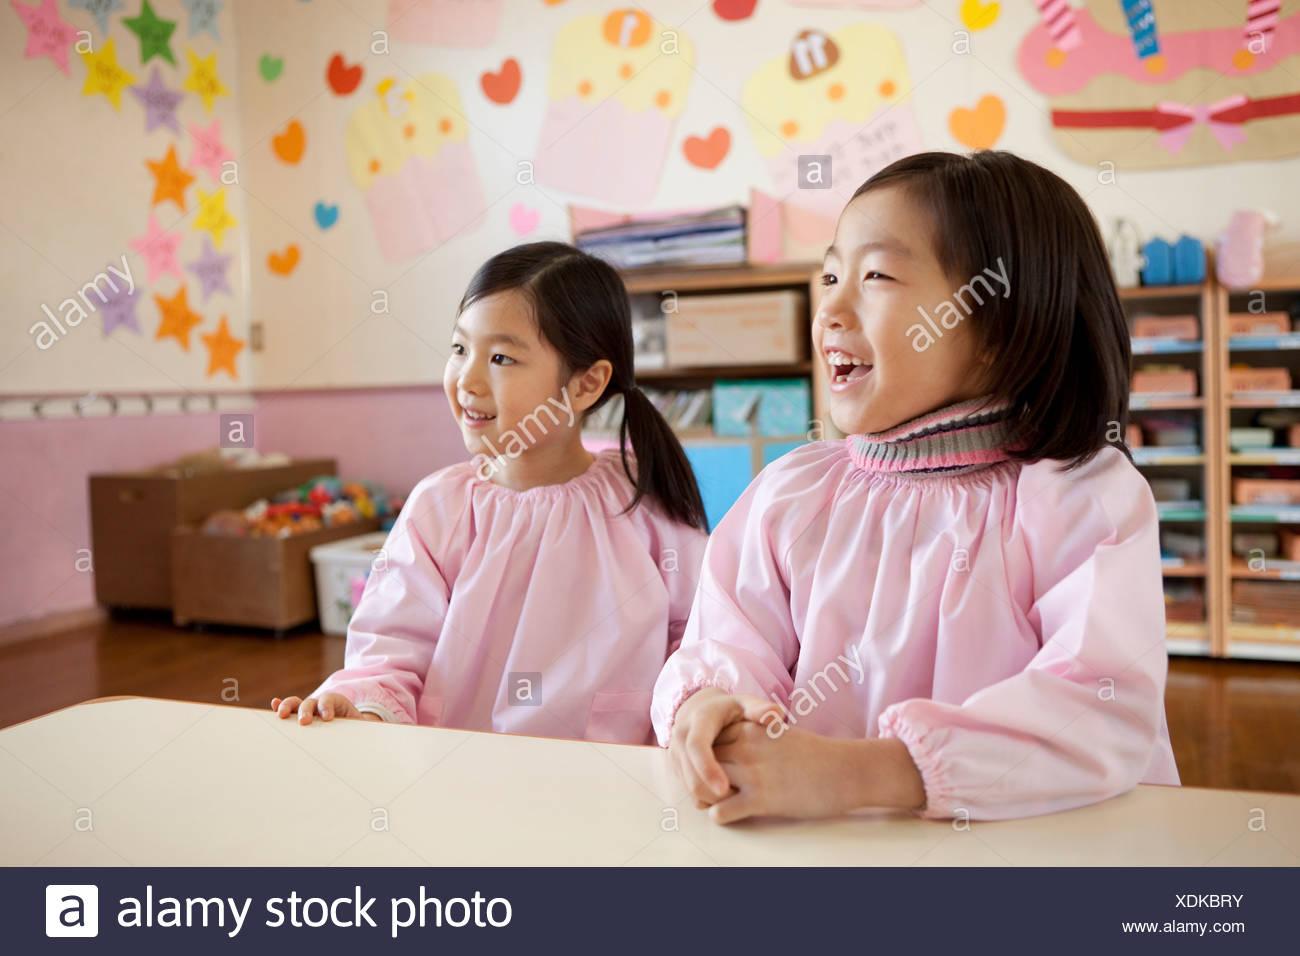 Kindergarten Children Sitting - Stock Image